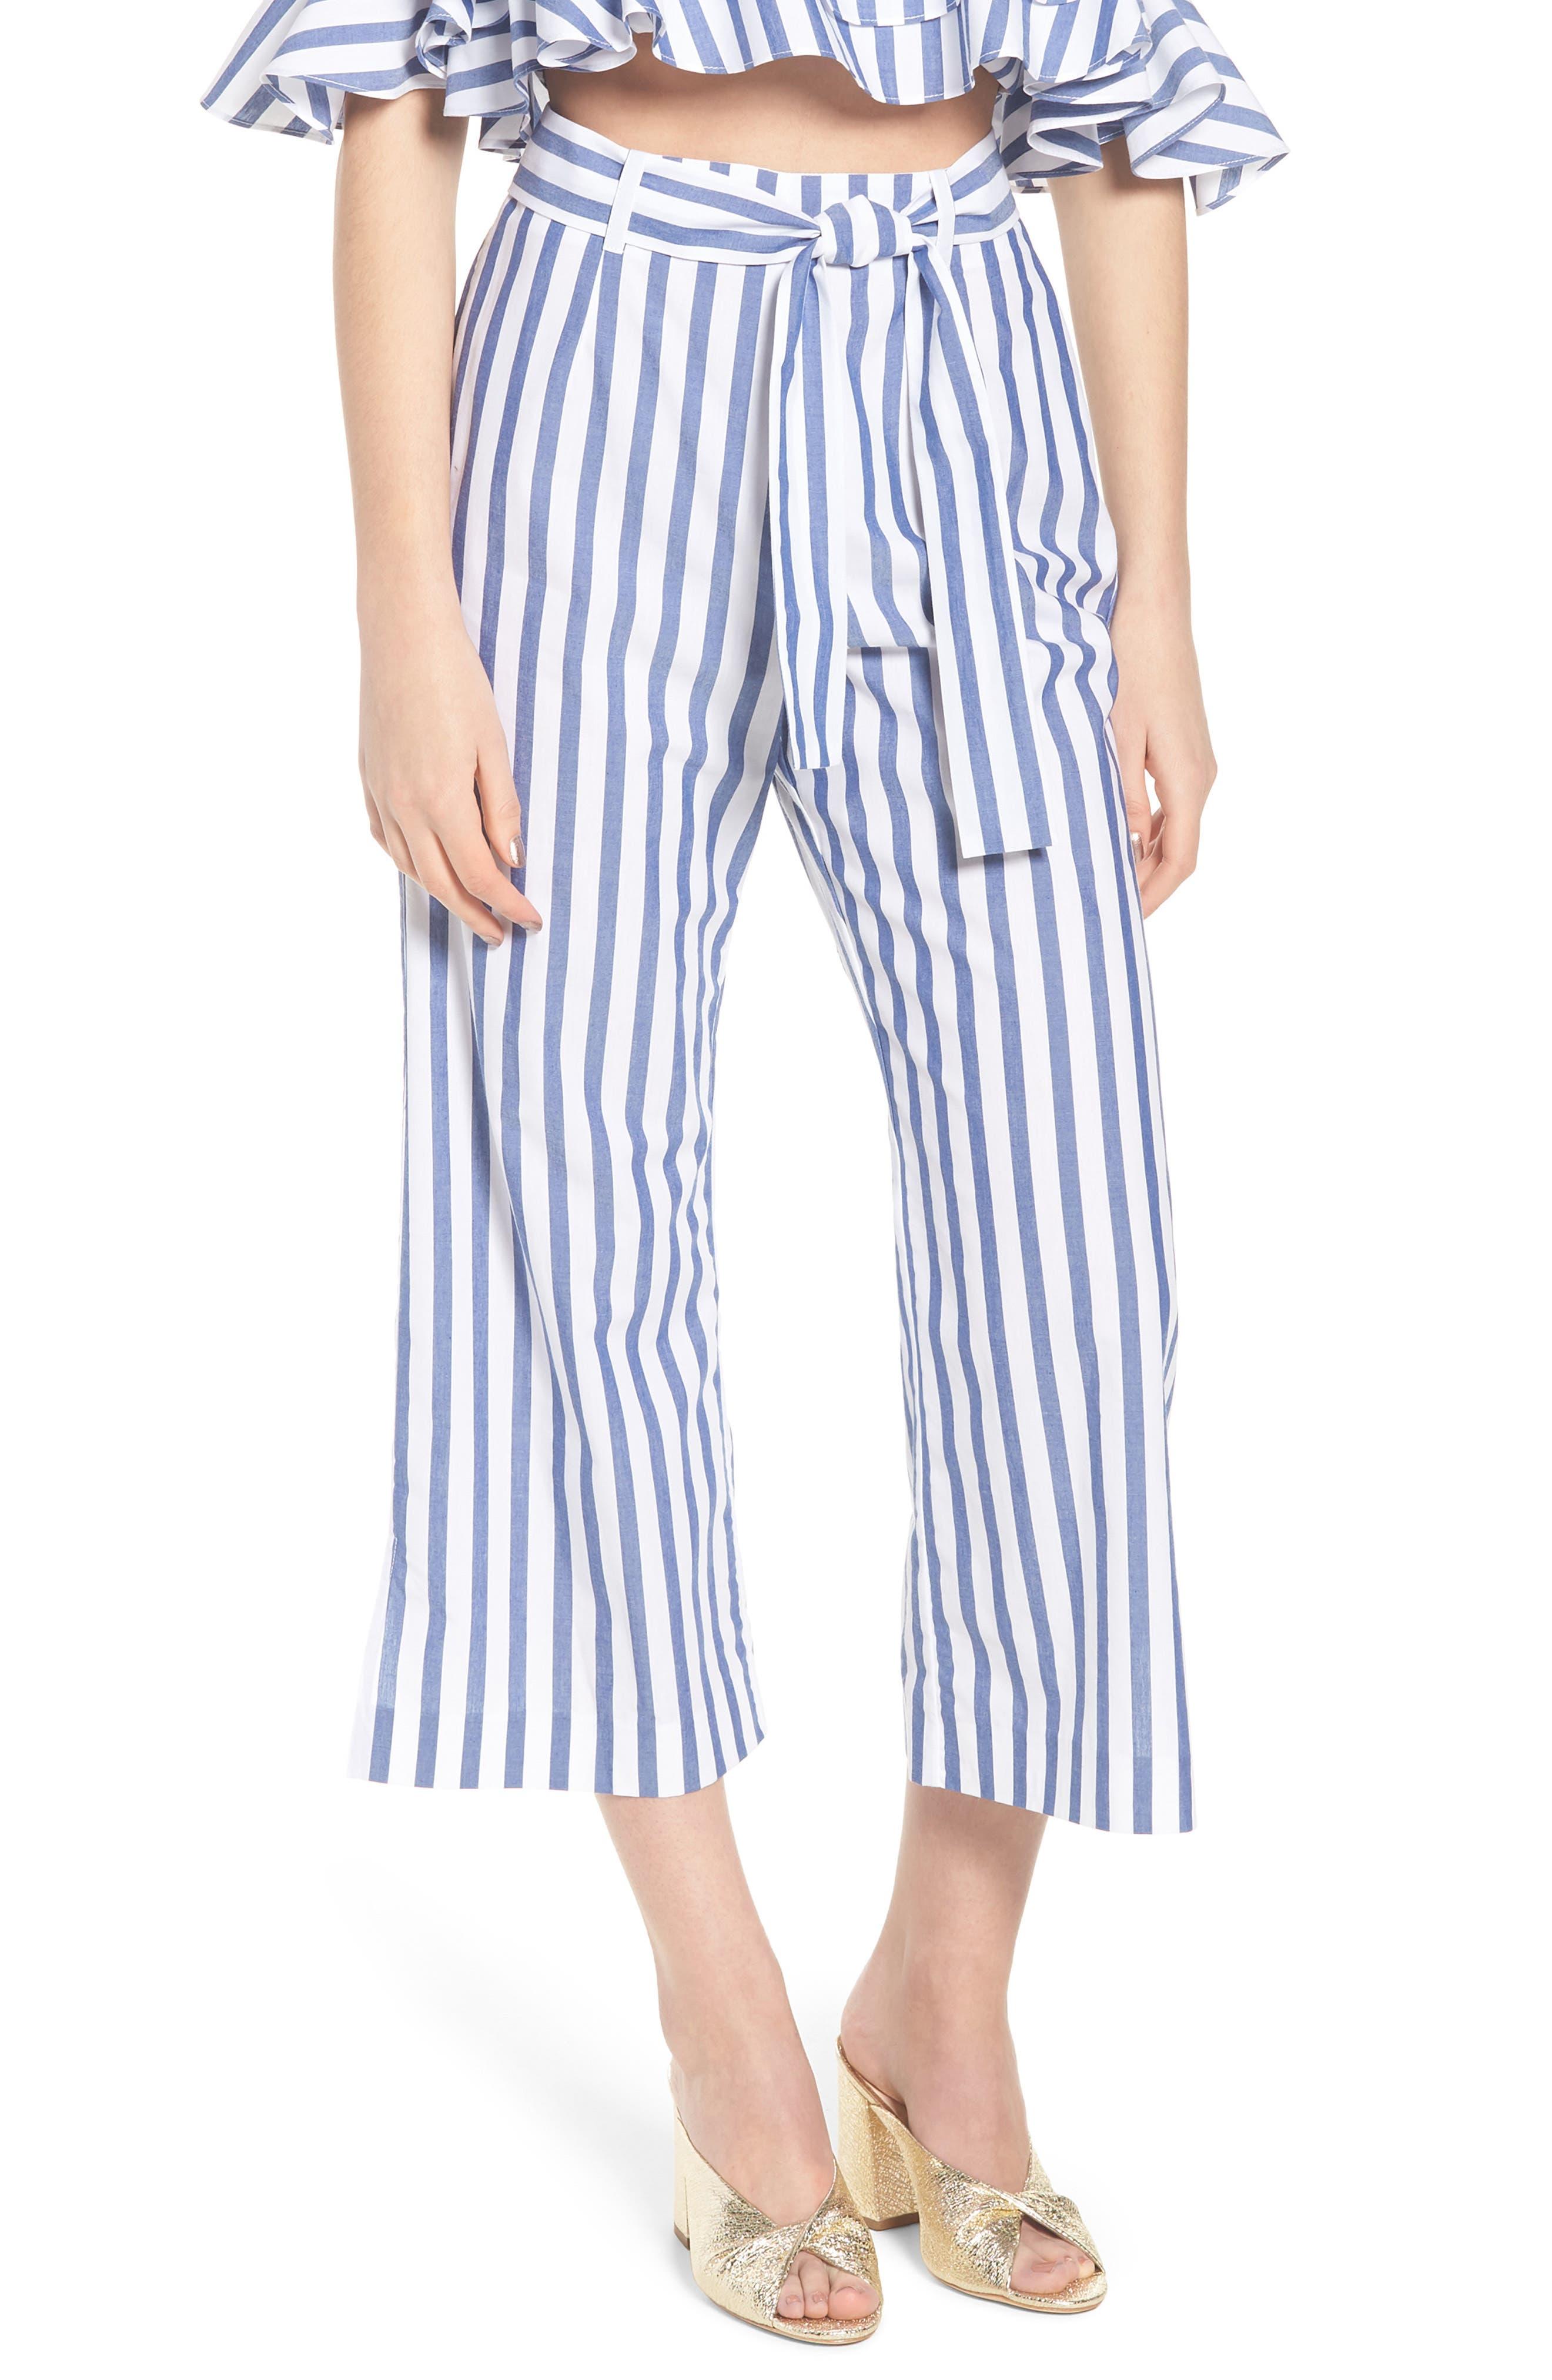 Aversa Crop Wide Leg Pants,                             Main thumbnail 1, color,                             Navy Stripe